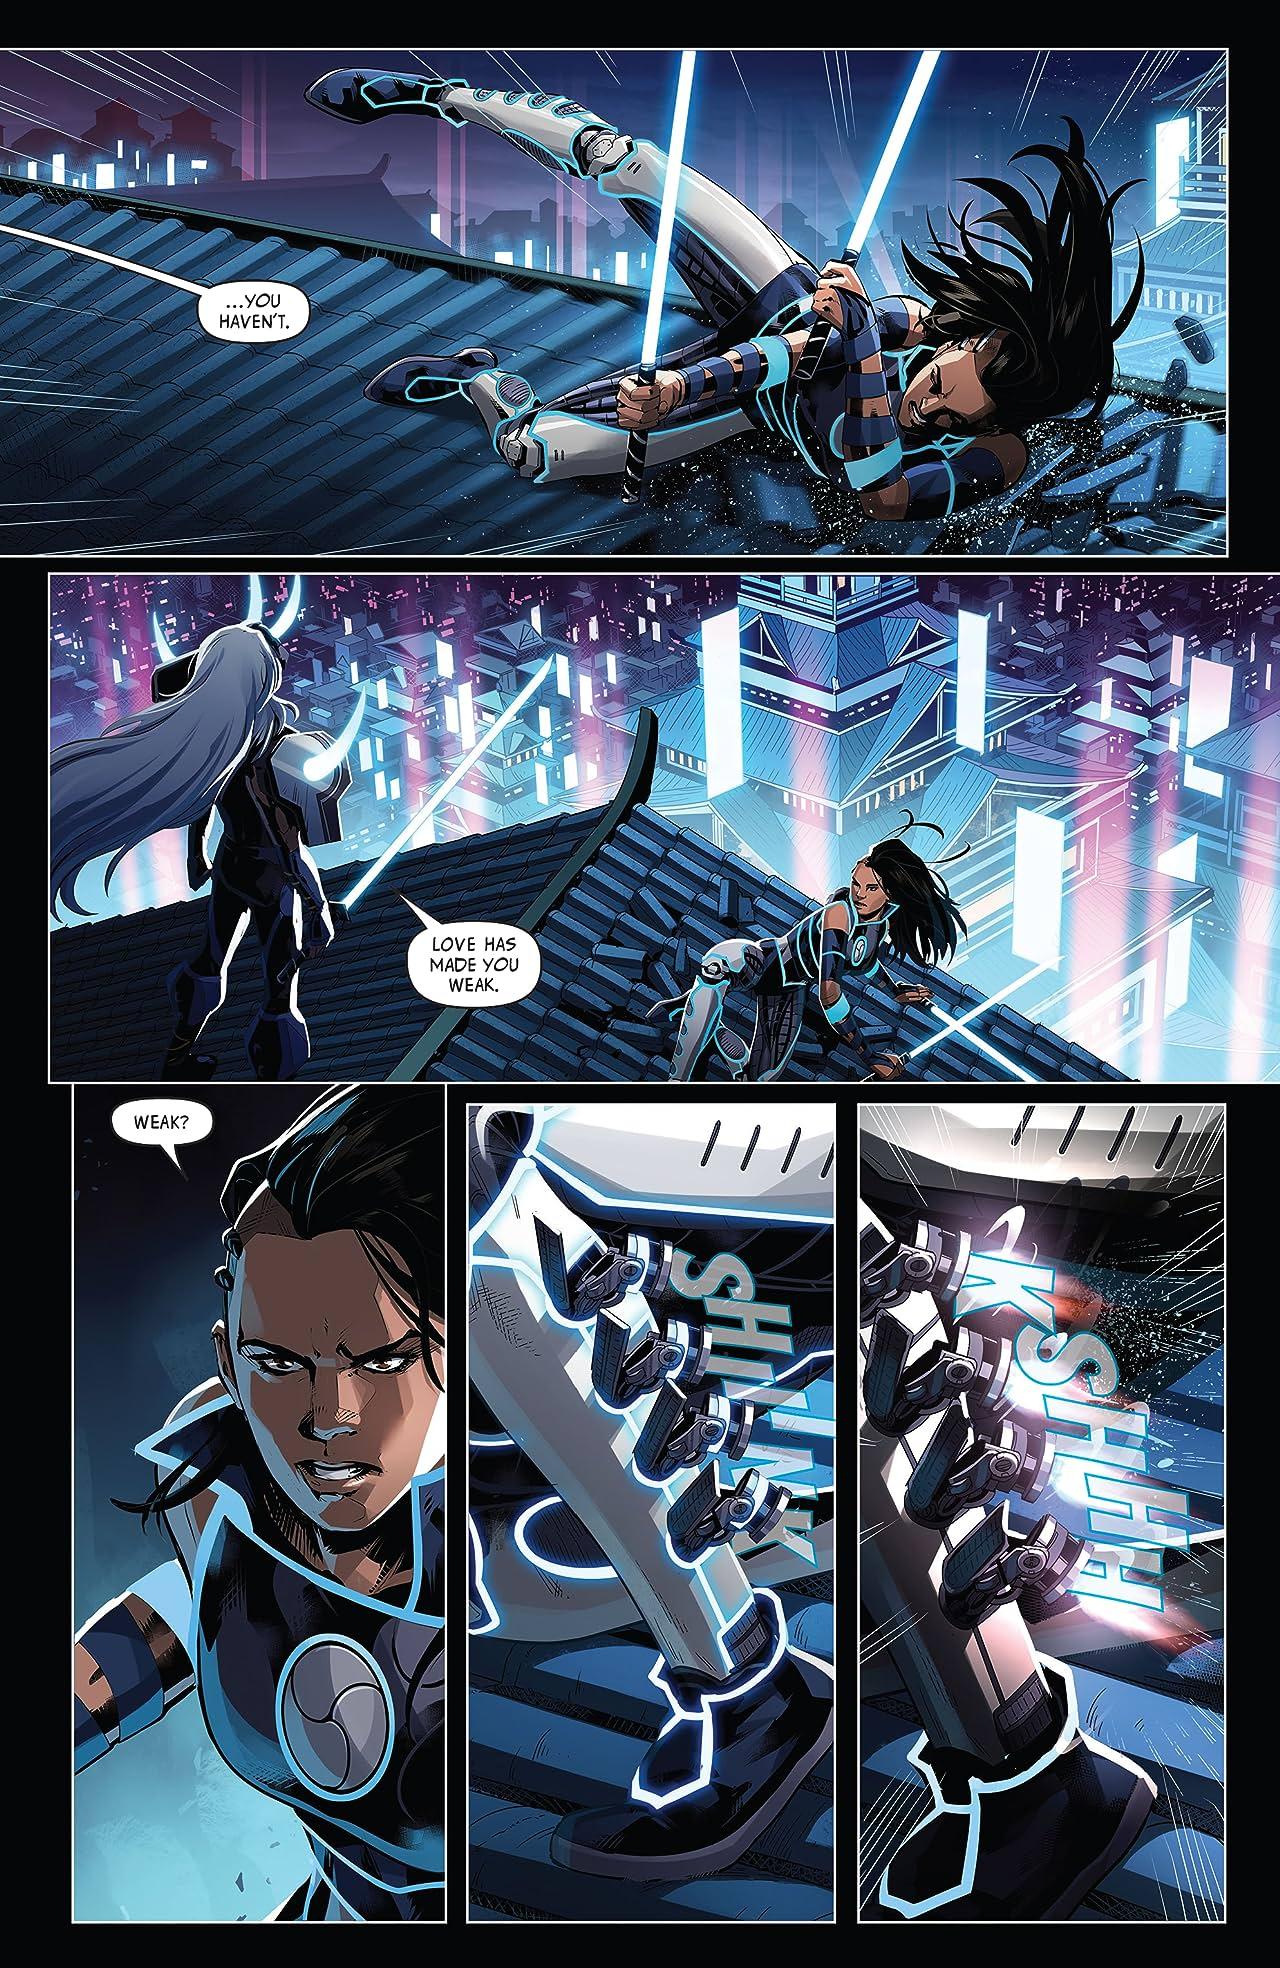 Neon Future Volume 2 #3